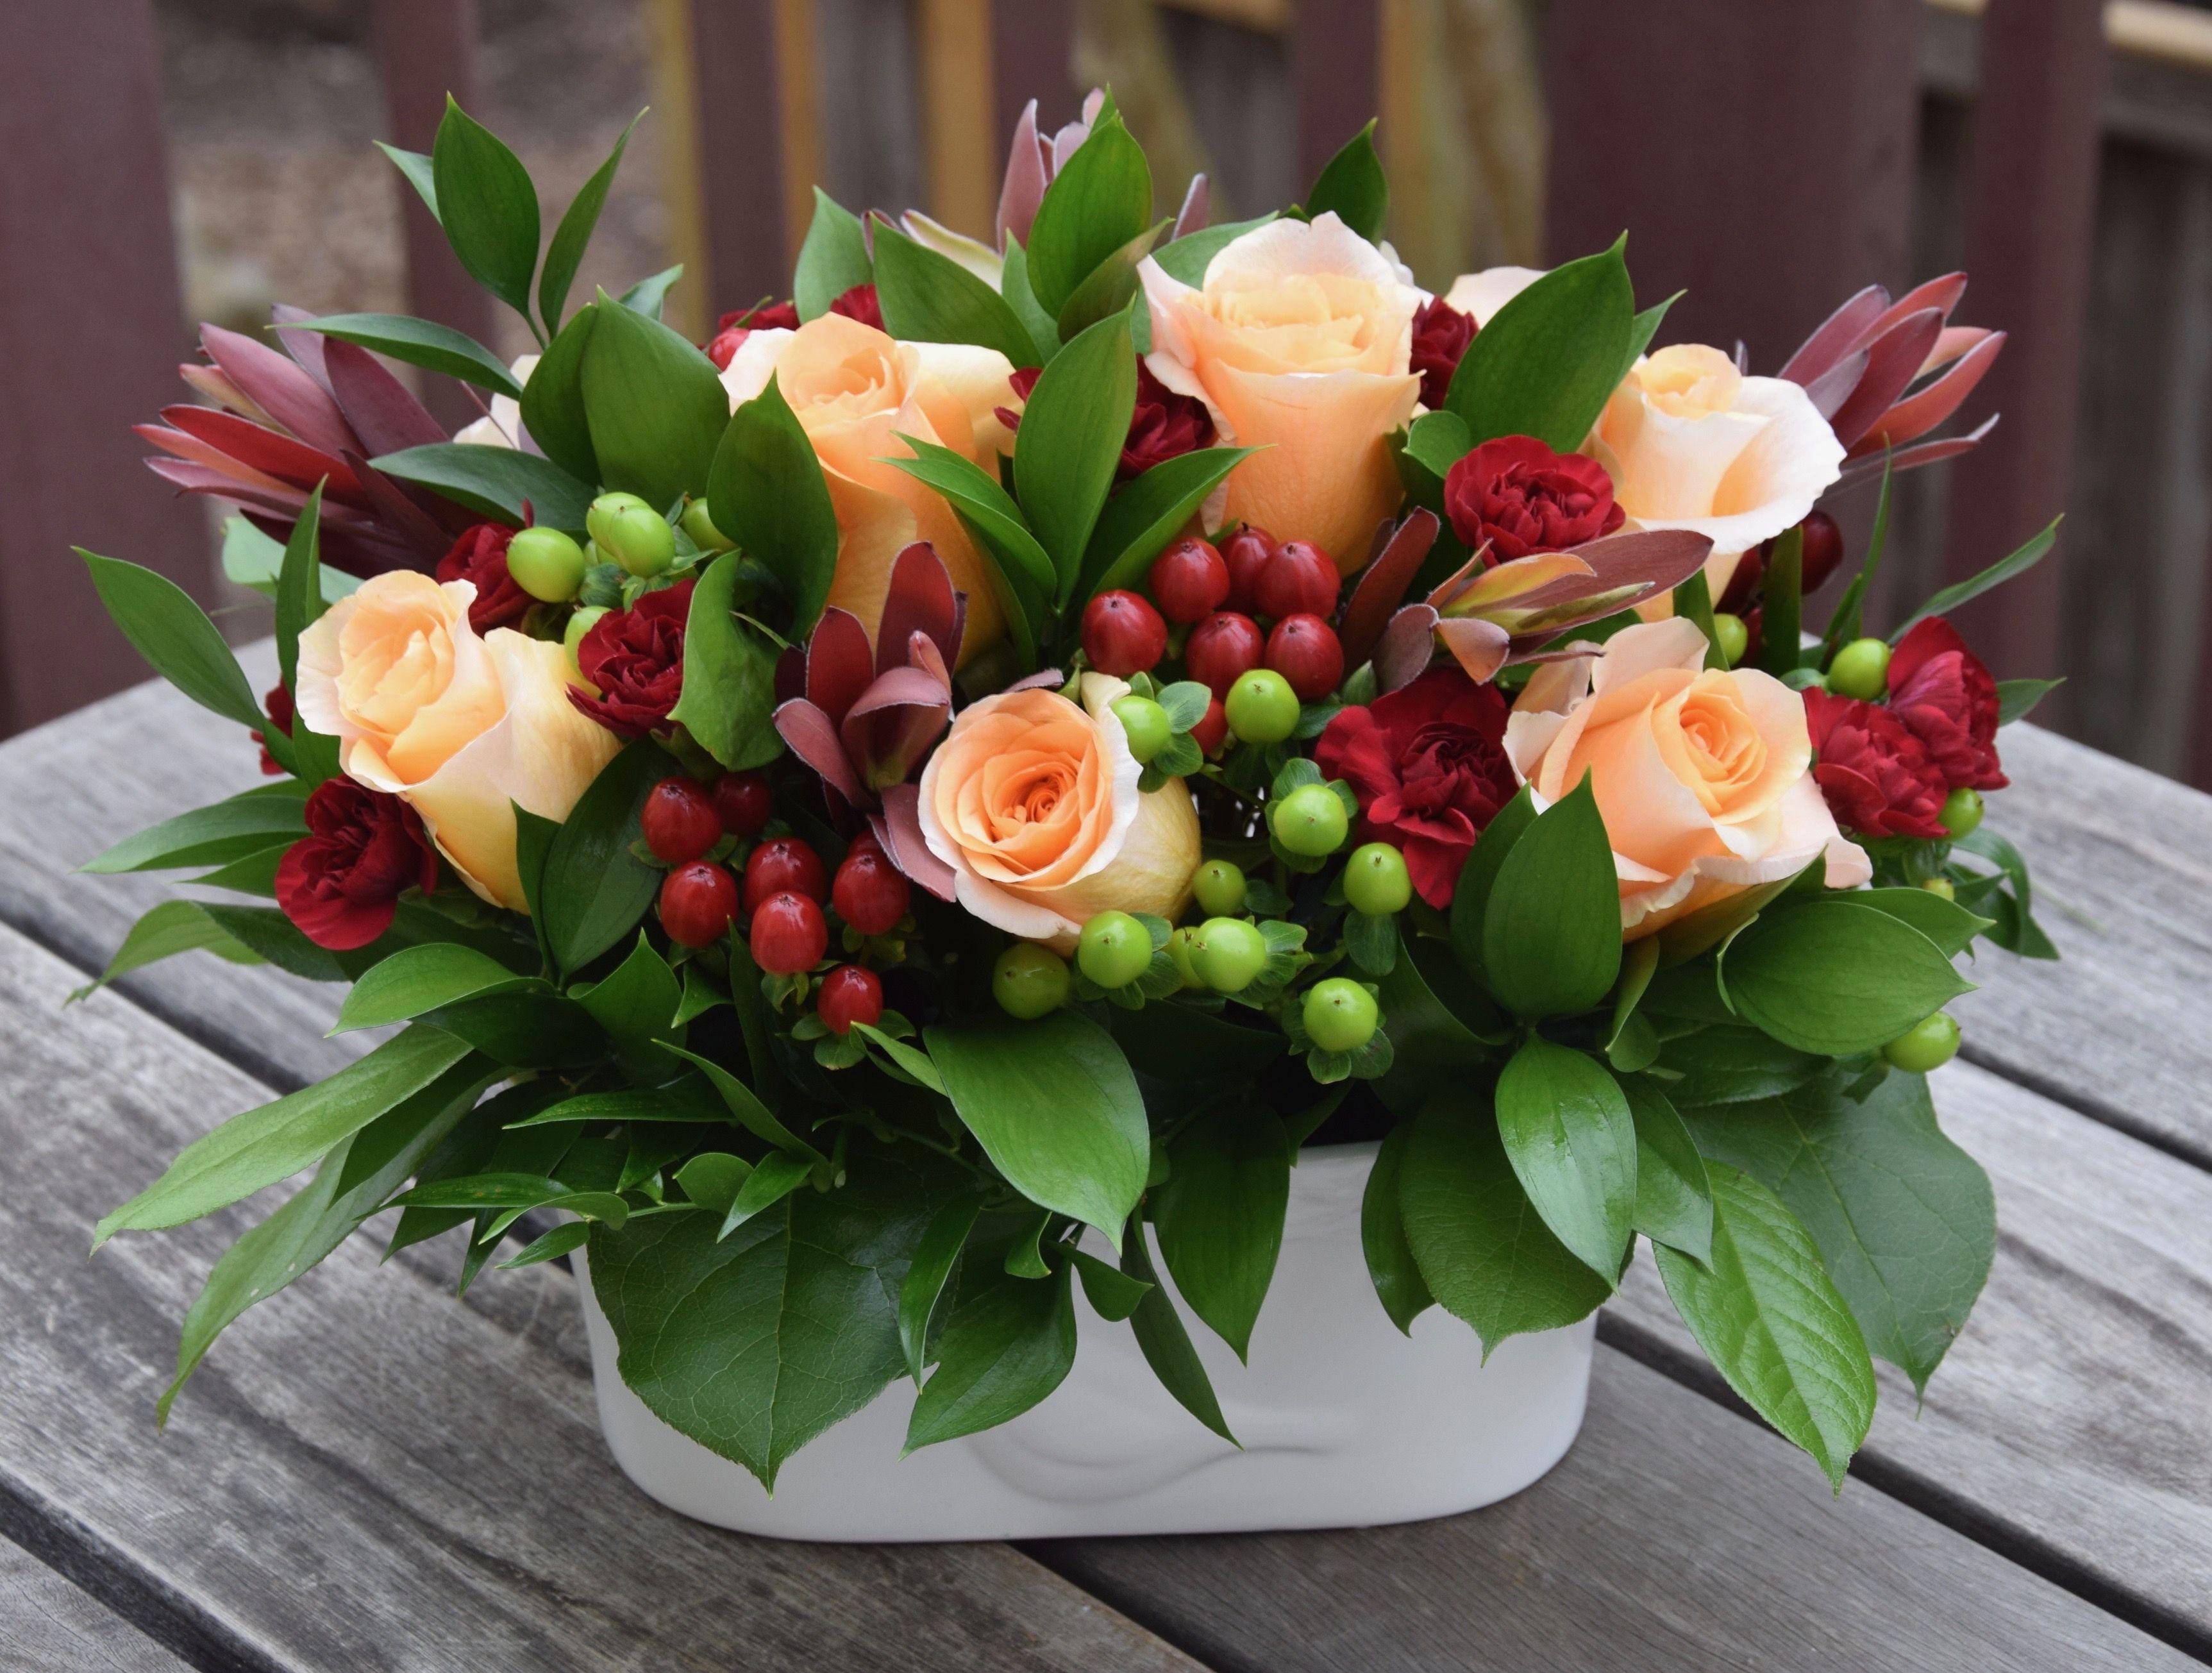 Fresh Flower Arrangement With Peach Roses Fresh Flowers Arrangements Easter Flower Arrangements Flower Arrangements Simple